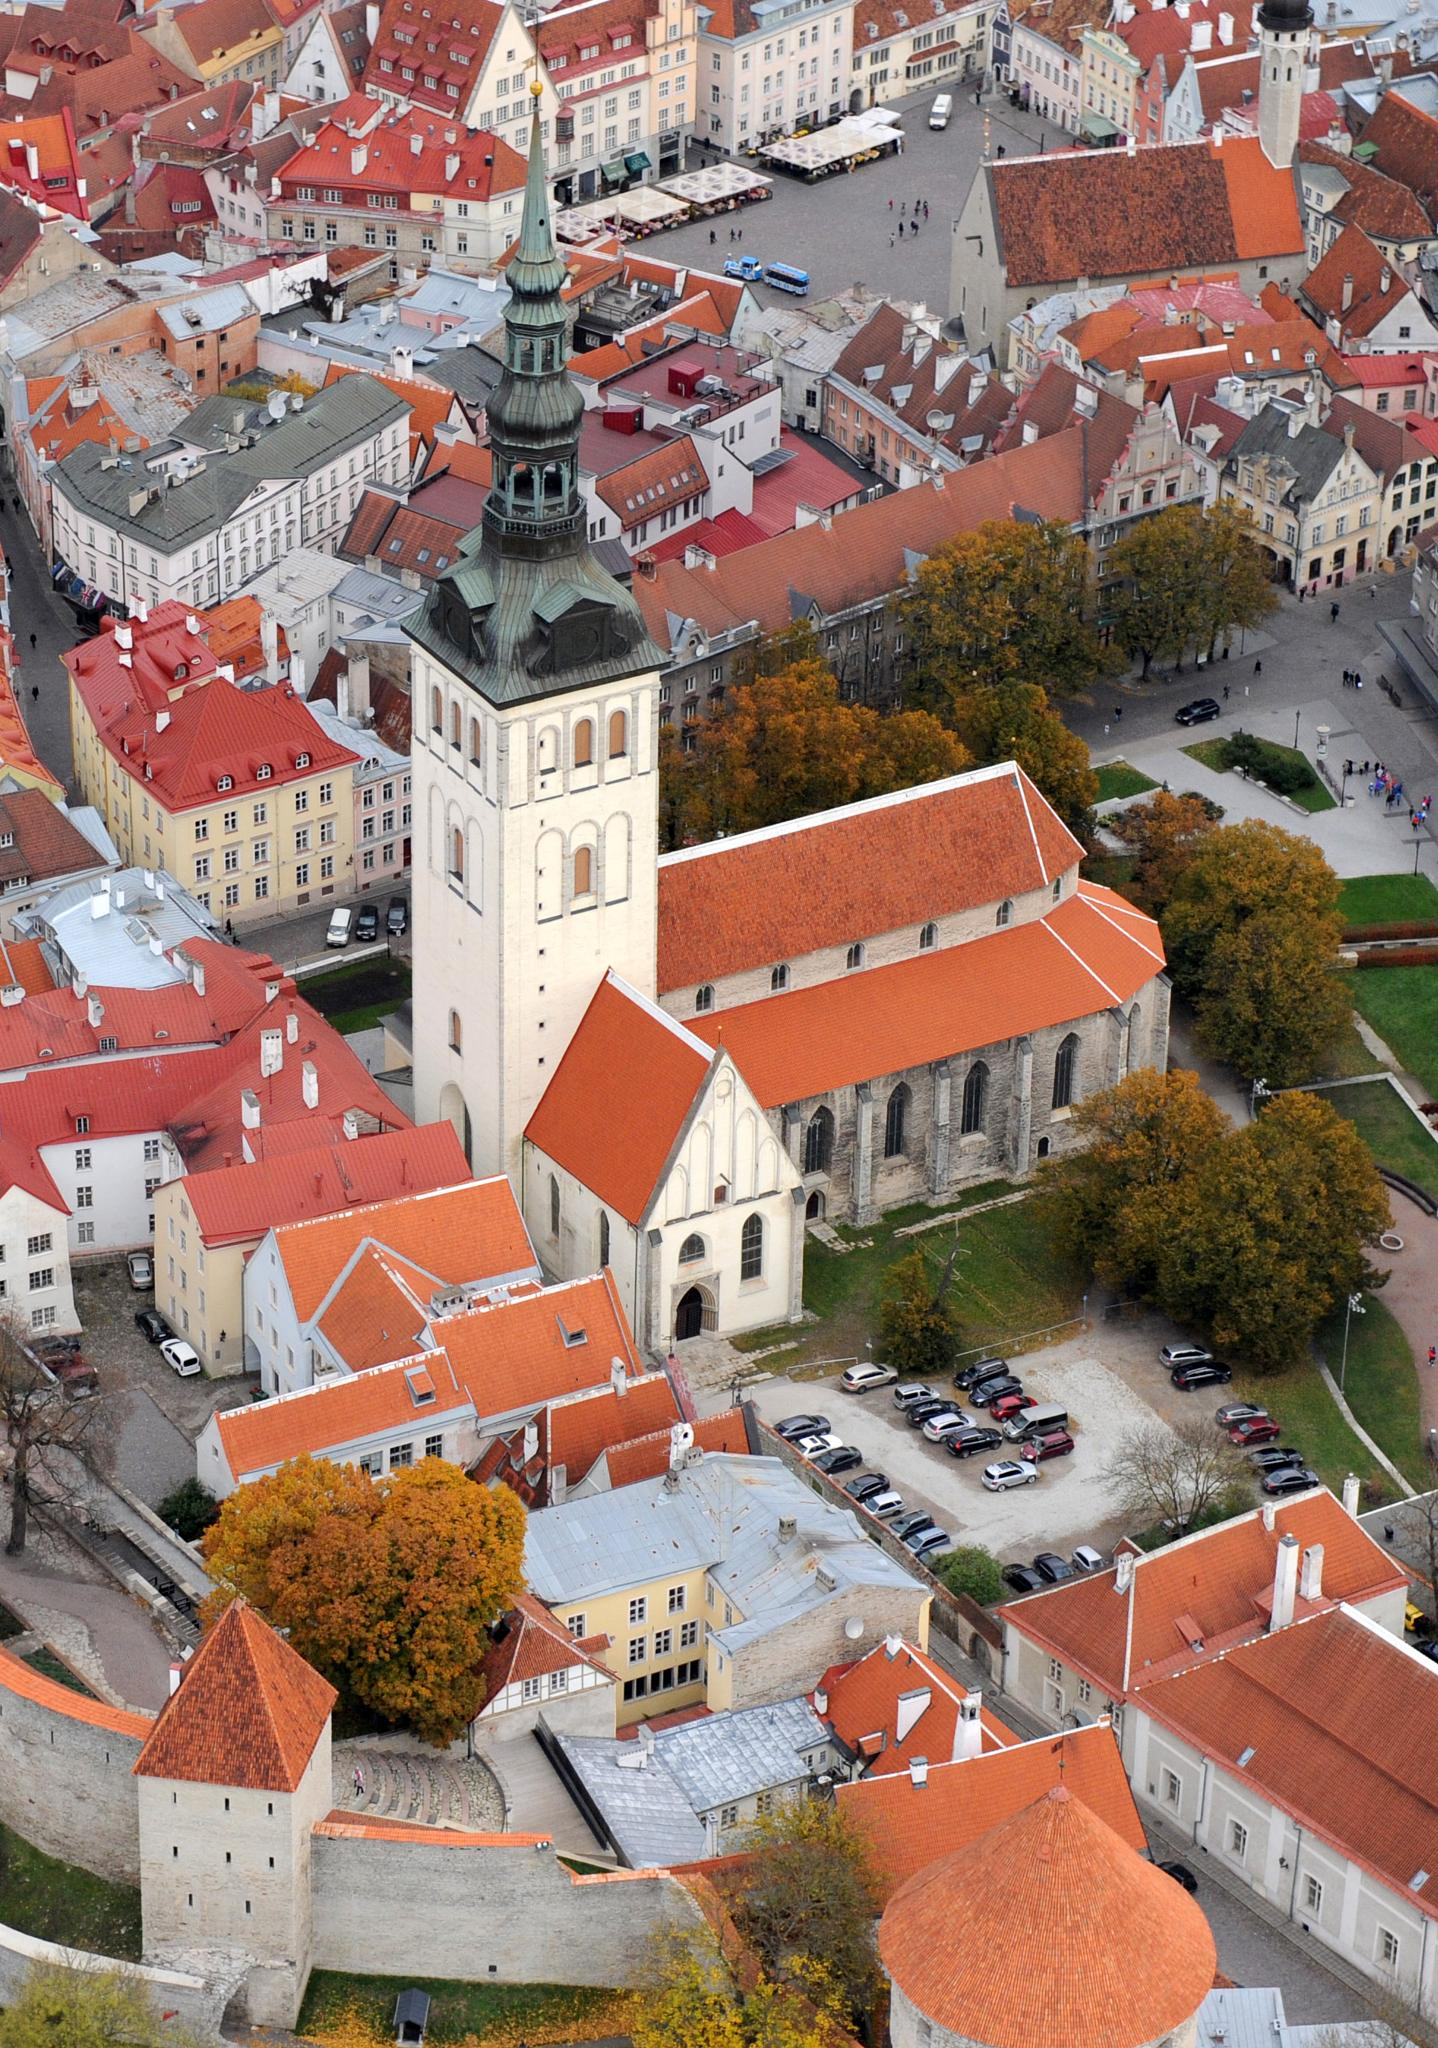 Tallinn vanalinn, Tallinn, Estonia by lasse.tur